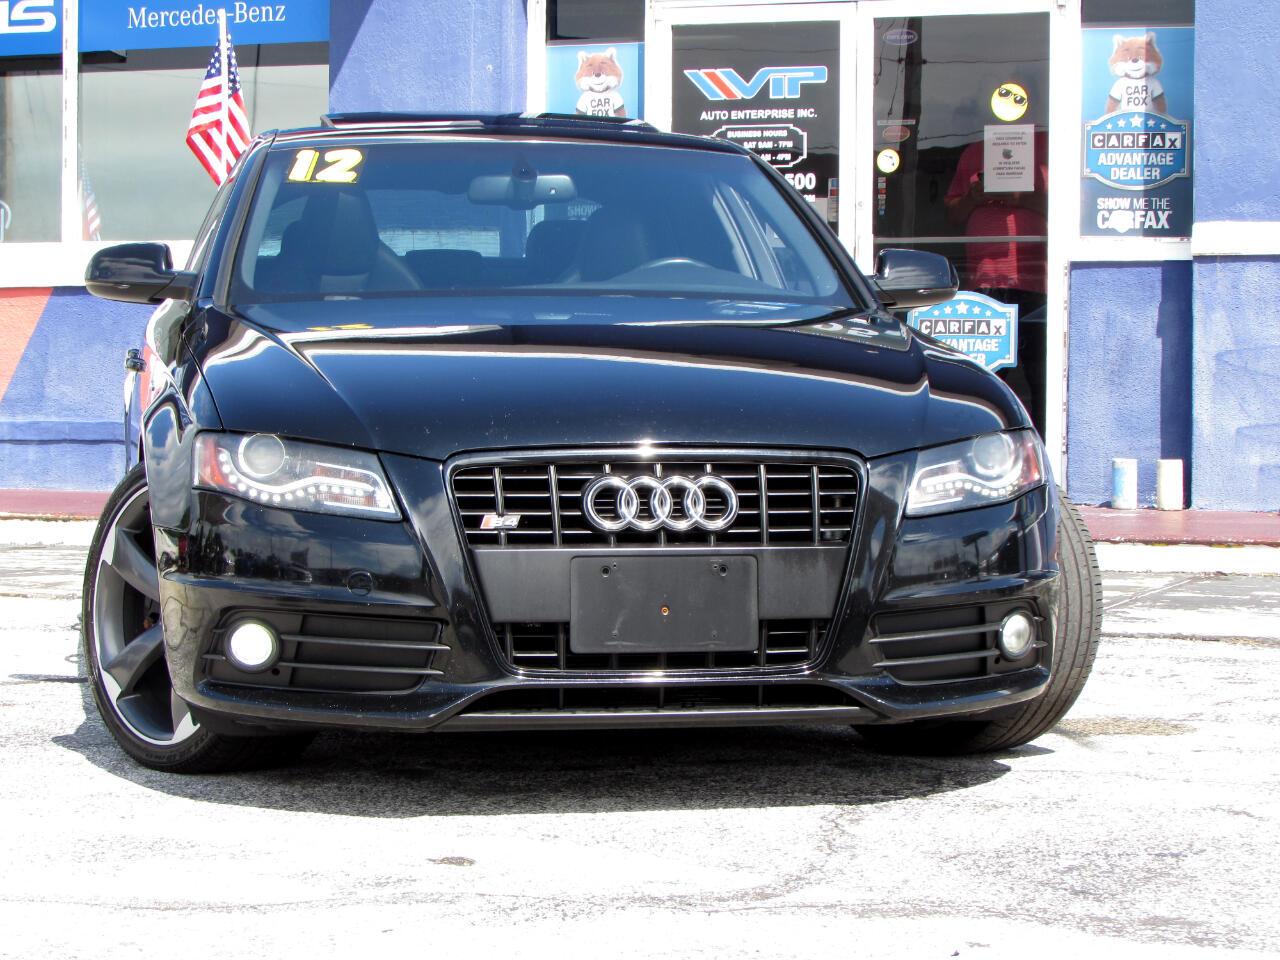 Audi S4 4dr Sdn S Tronic Prestige 2012